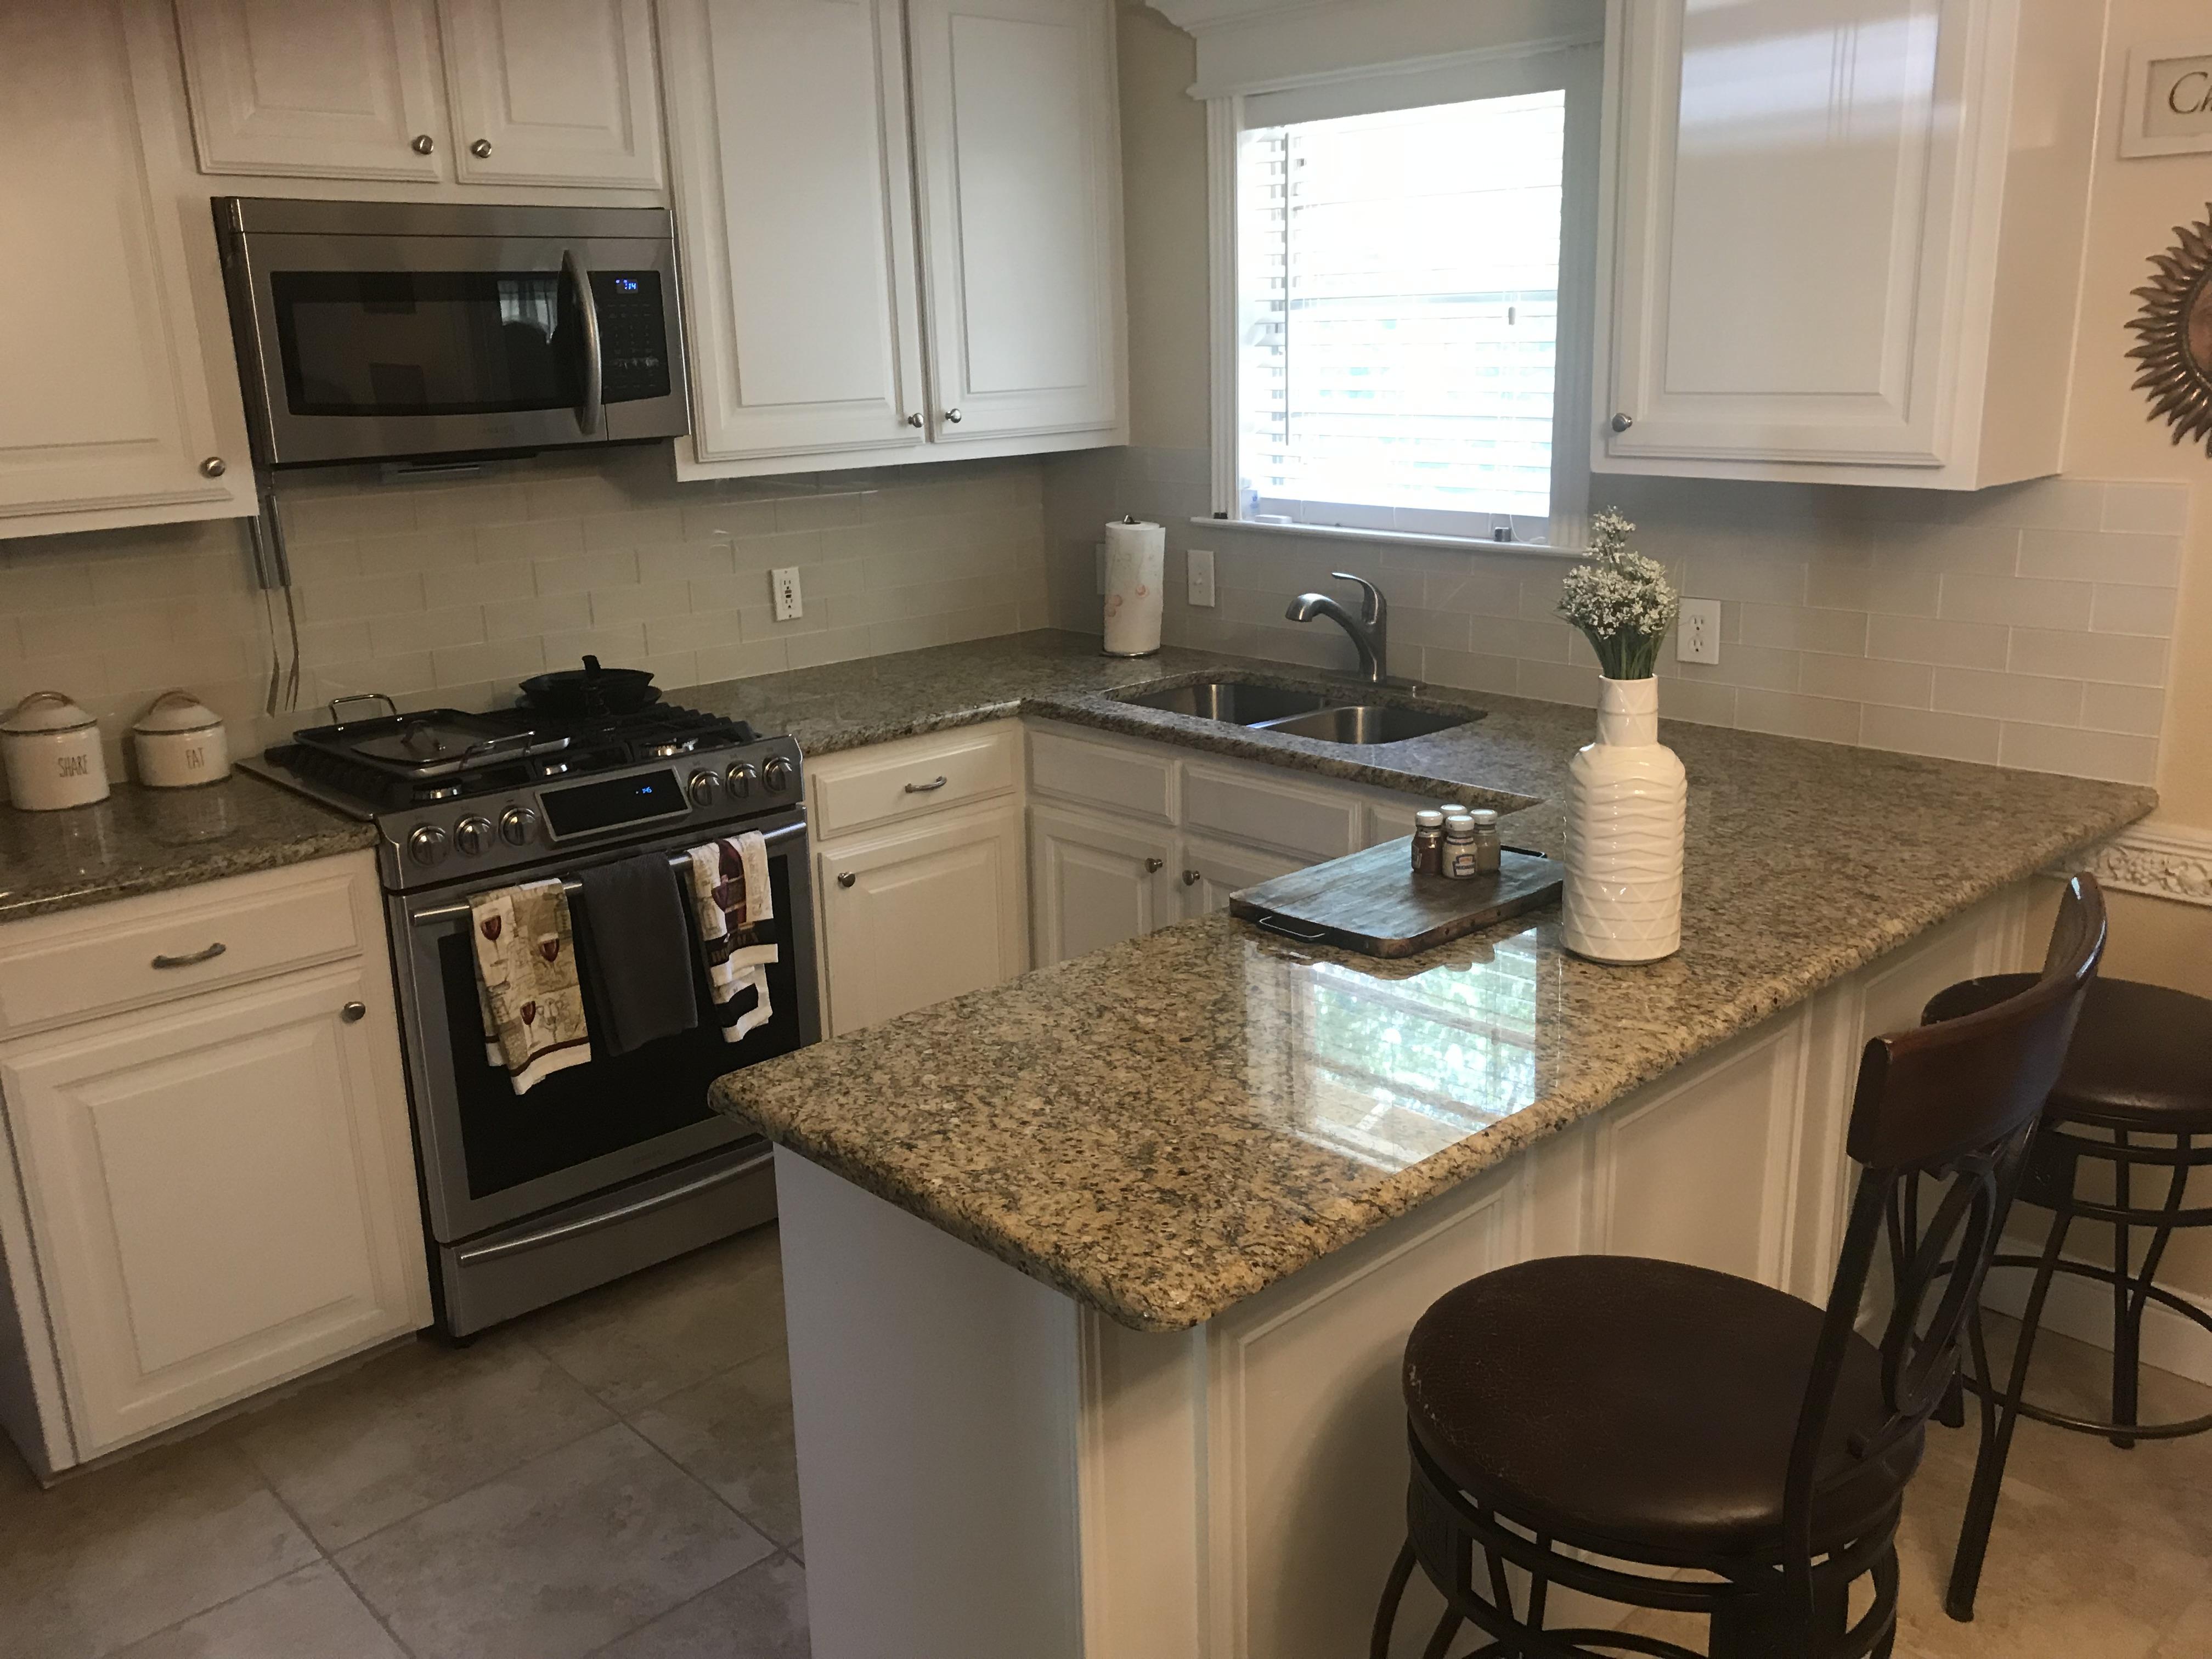 Kitchen Repair and Remodel